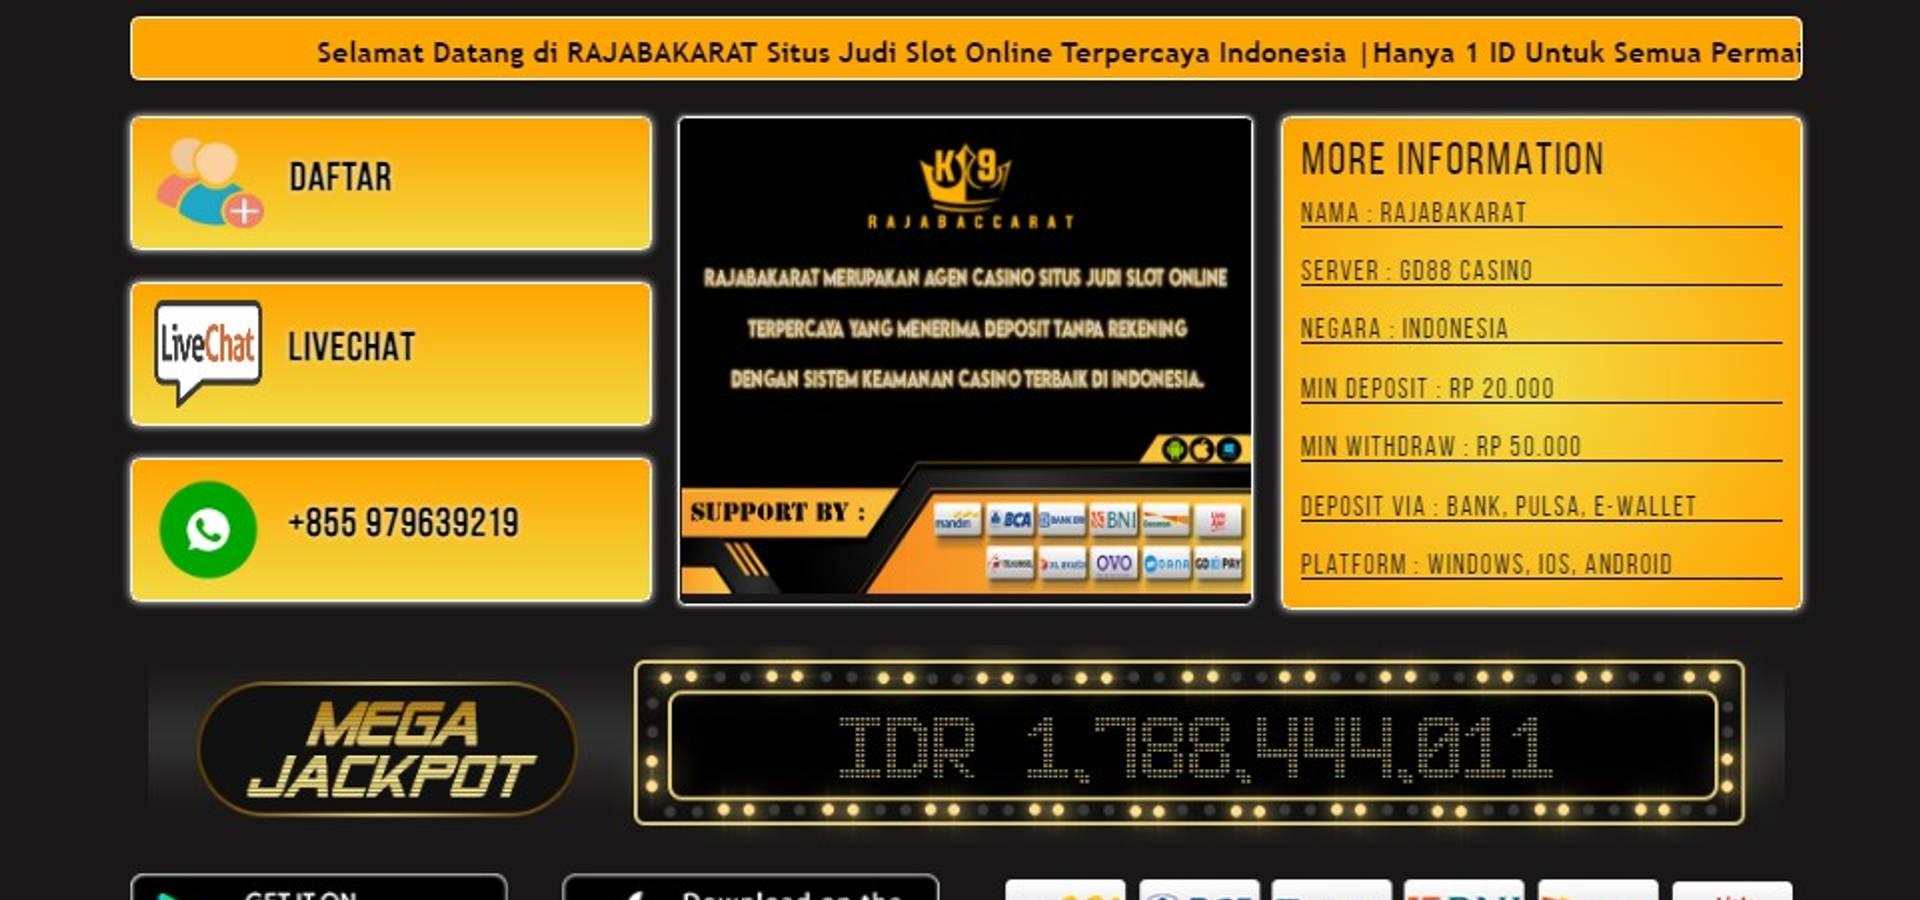 Judi Slot Online Terpercaya 2021 Windows In Central Jakarta Homify